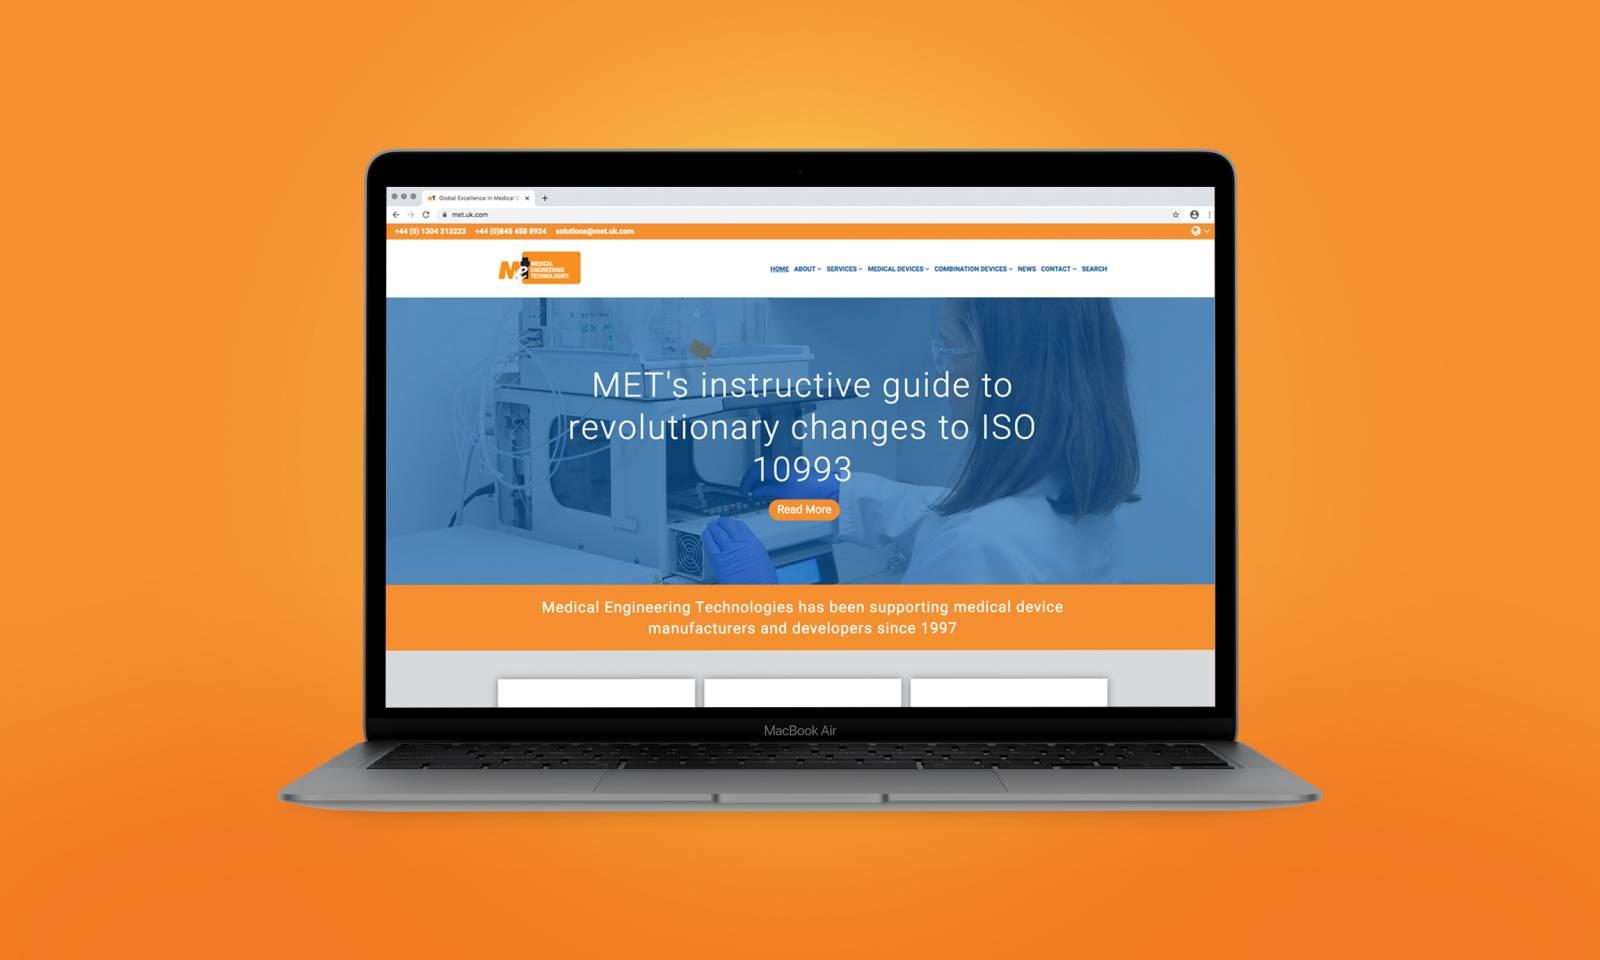 Website-met-website-corporate-identity-agency-graphic-design-canterbury.jpg